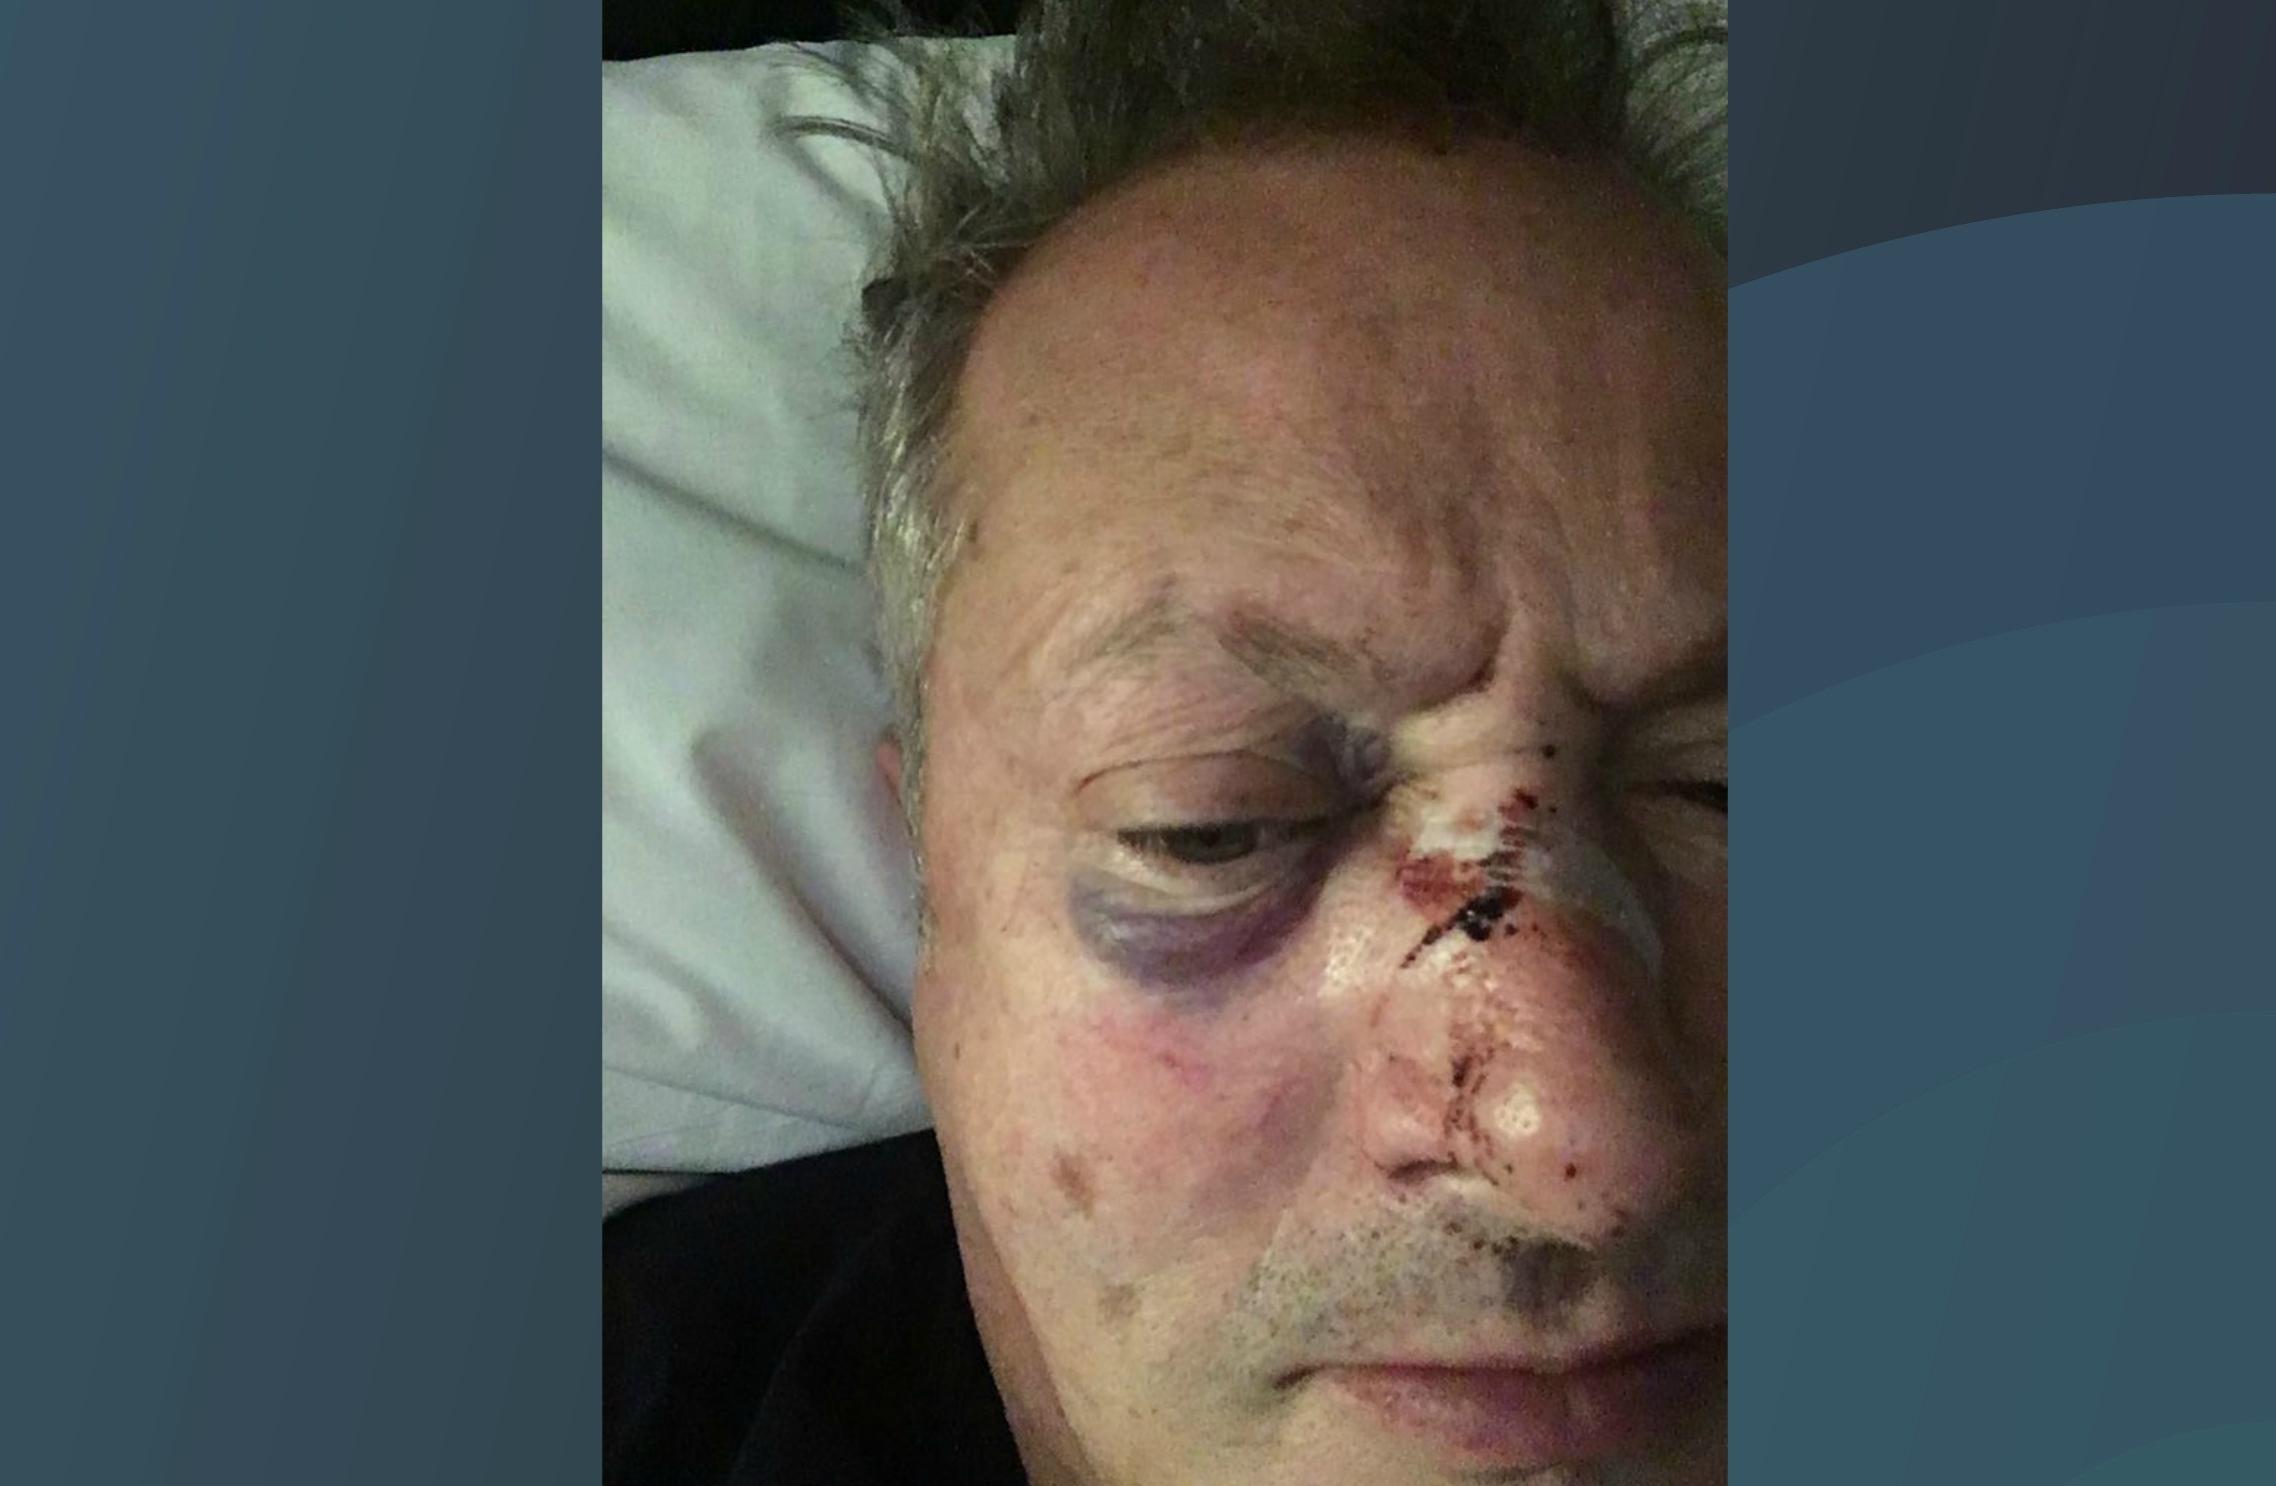 Nick Nairn was assaulted in Aberdeen.